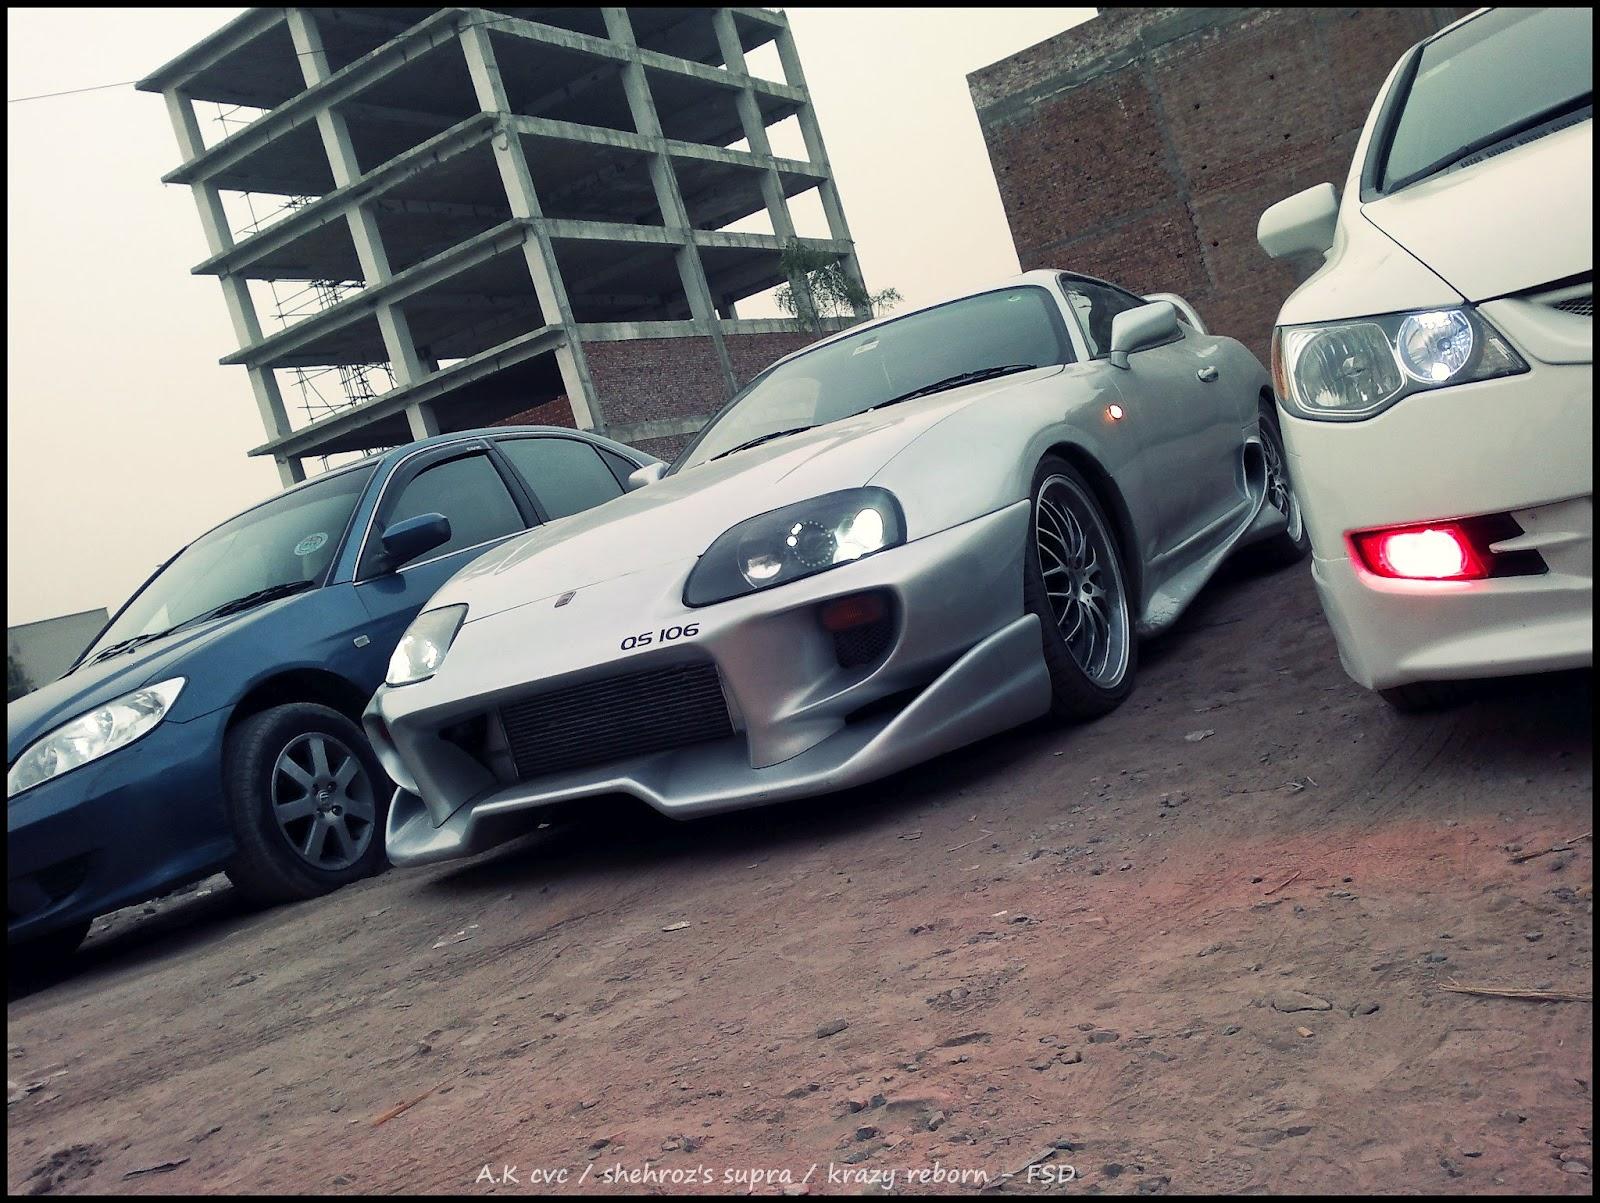 Krazy Car: Shehroz's Supra And Krazy Reborn